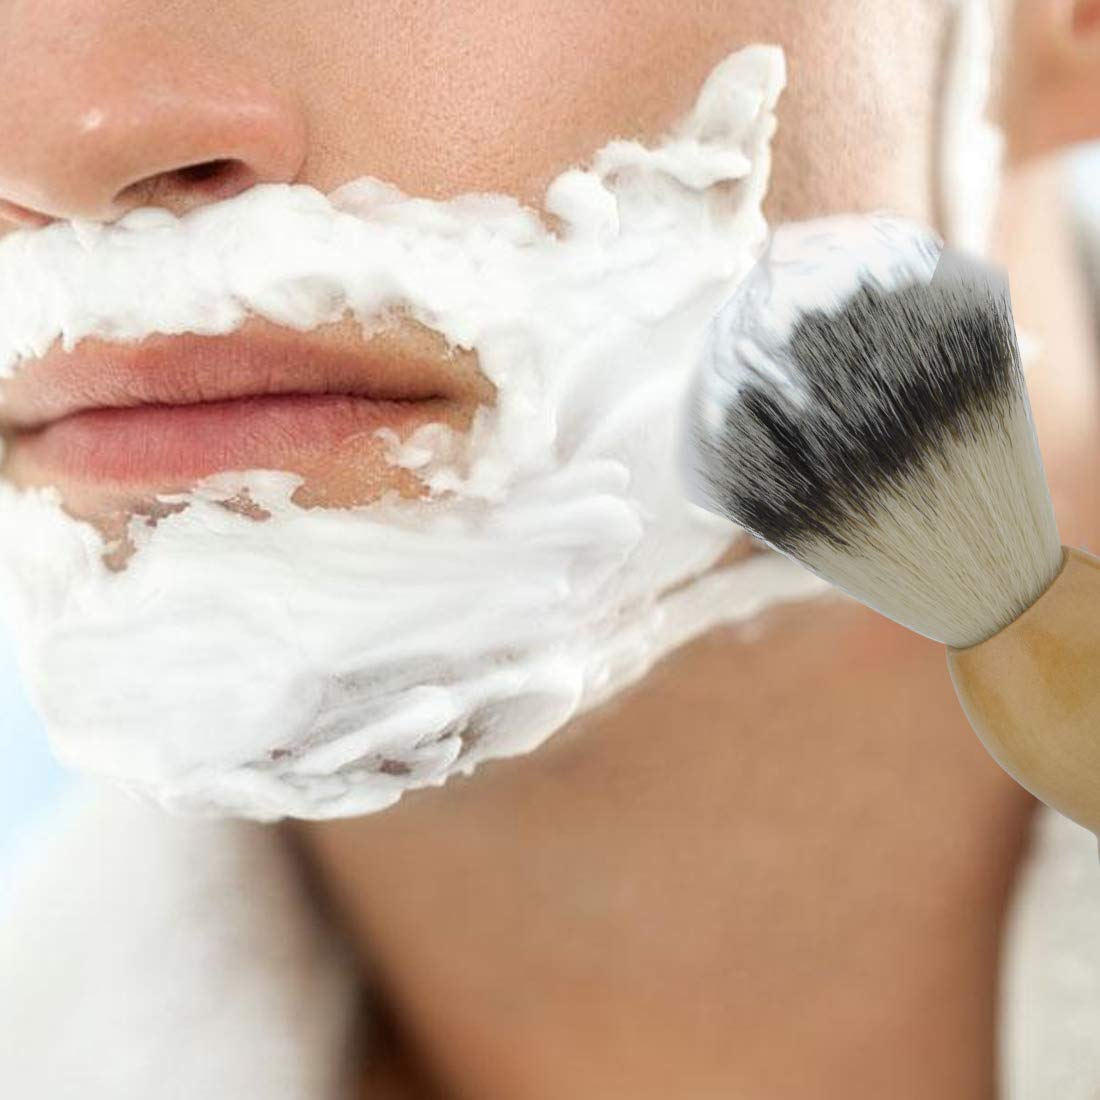 Yolyoo Shaving Brush Set, Shaving Stand with Shaving Bowl,Shaving Brush Natural Solid Wood Handle and Stainless Steel Shaving Stand&bowl Kit for Men